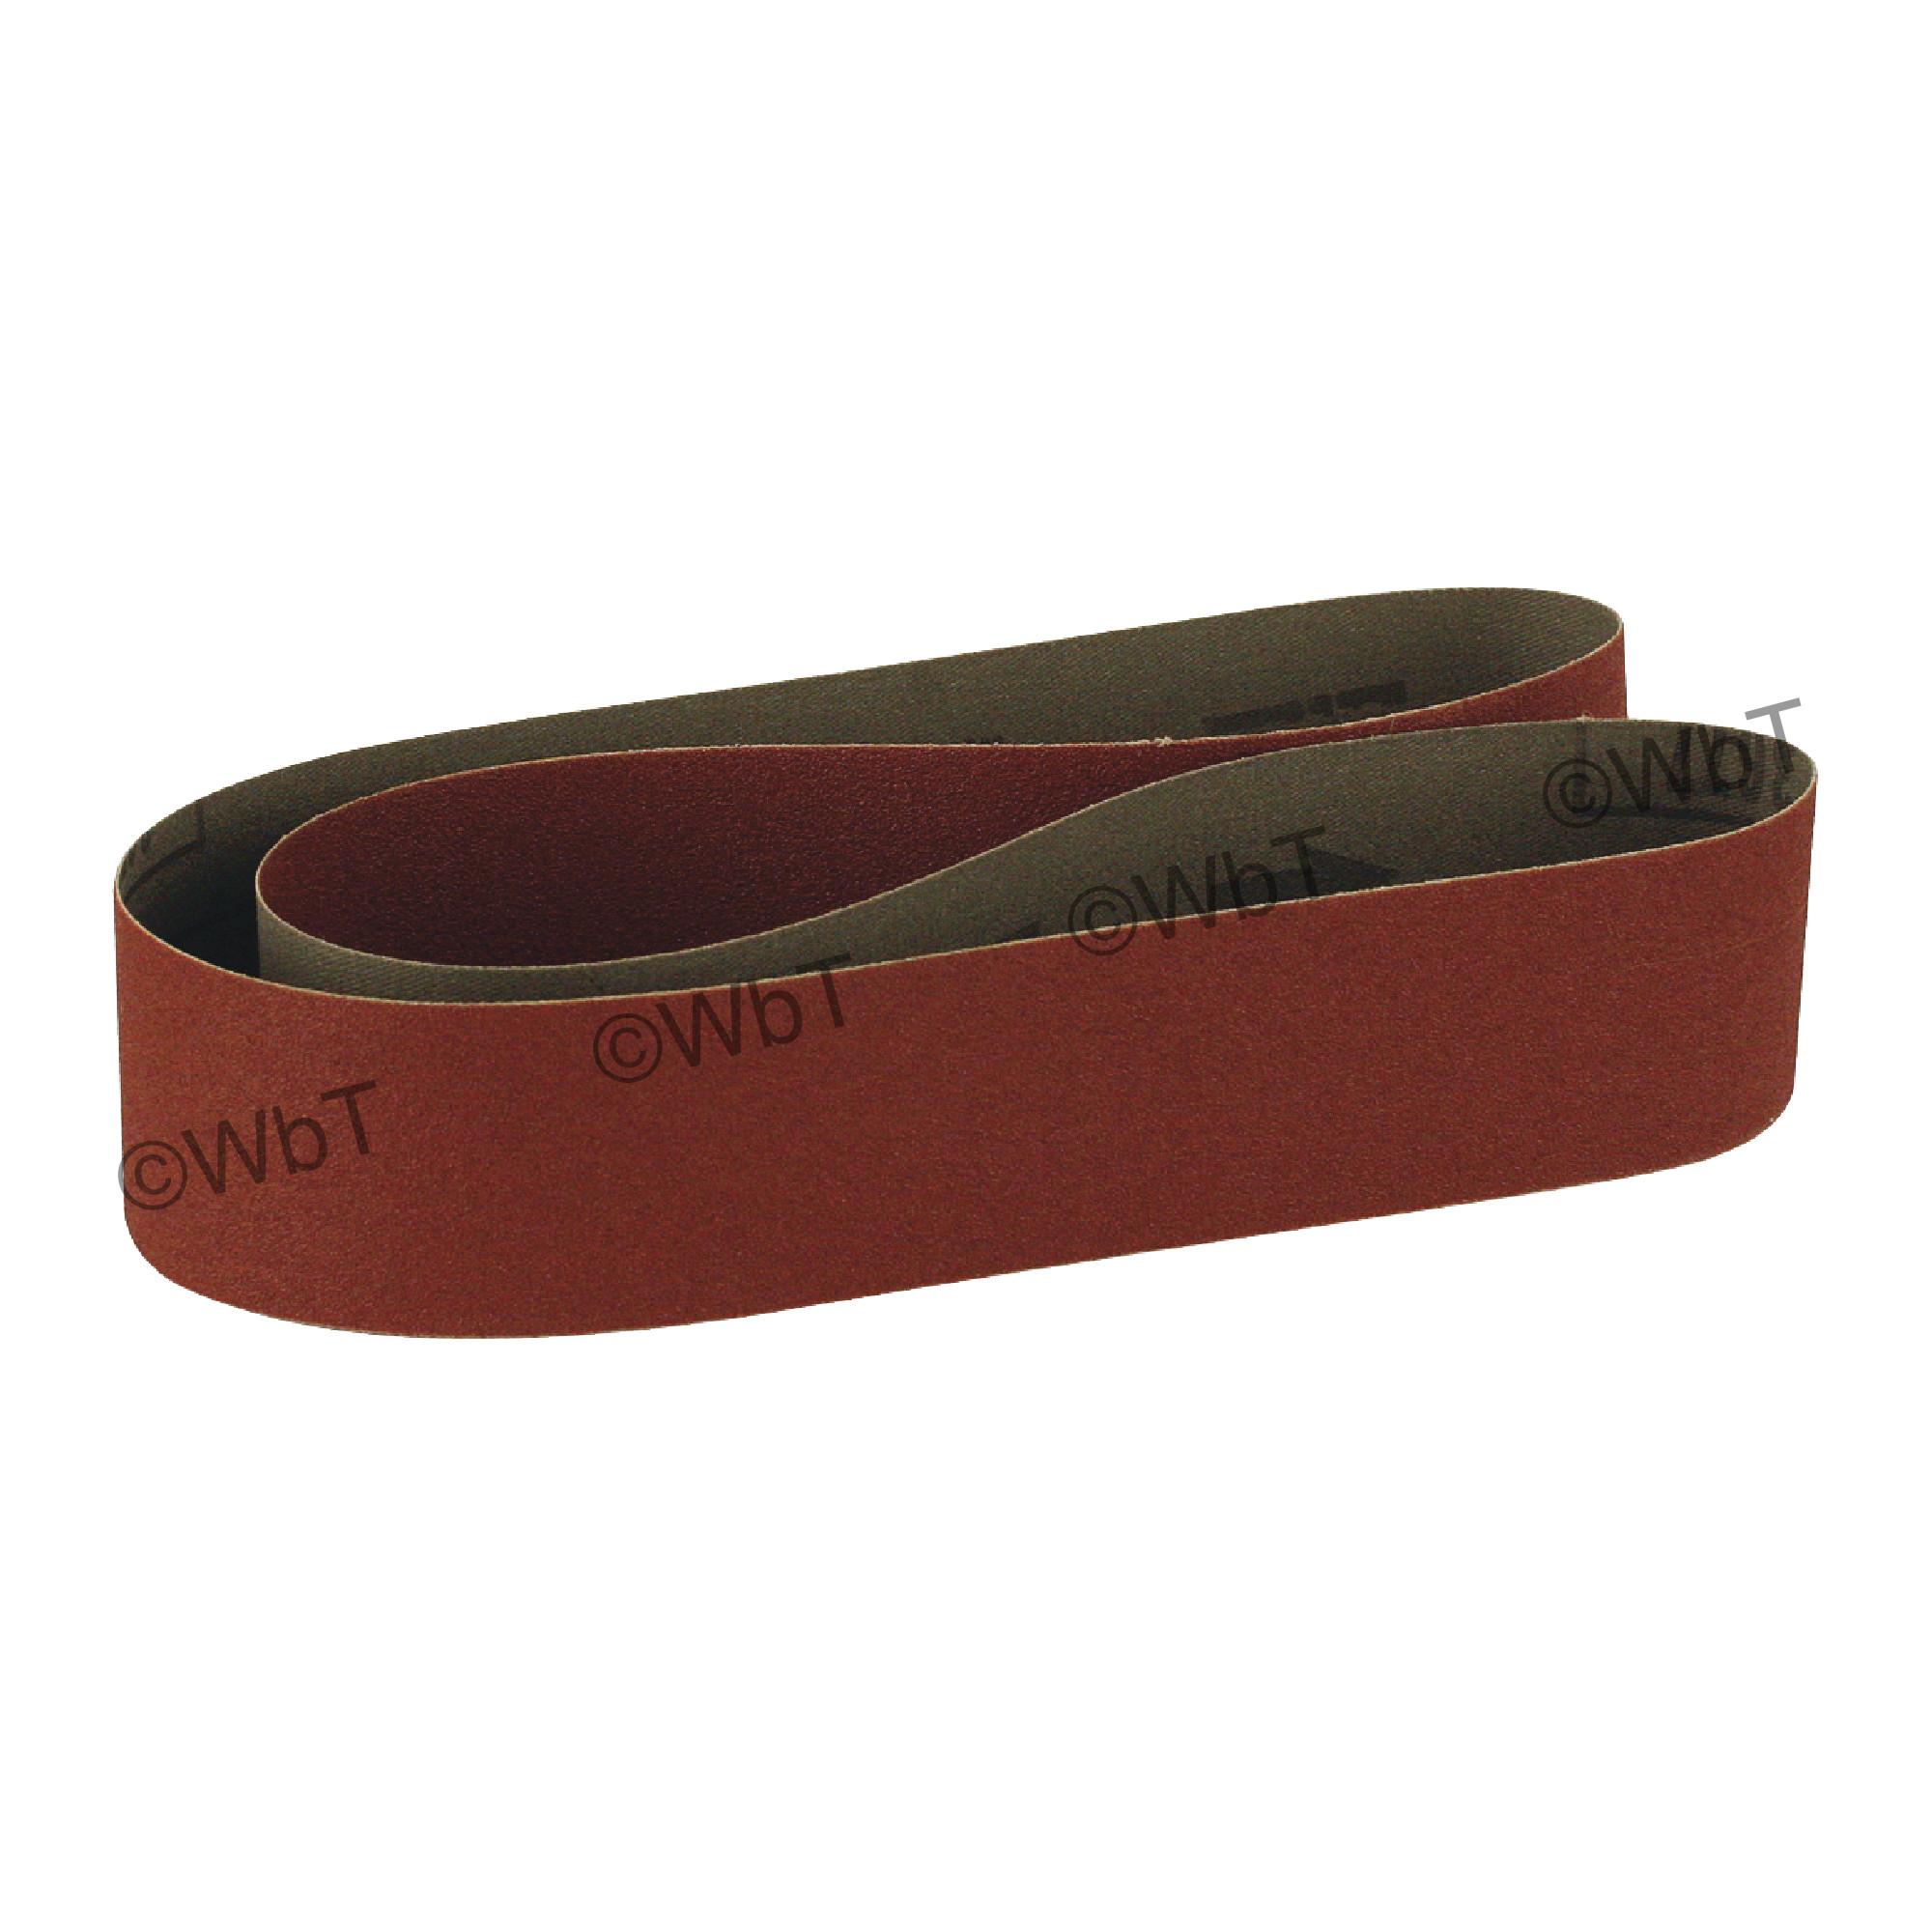 "2"" x 42"" Replacement Belt"